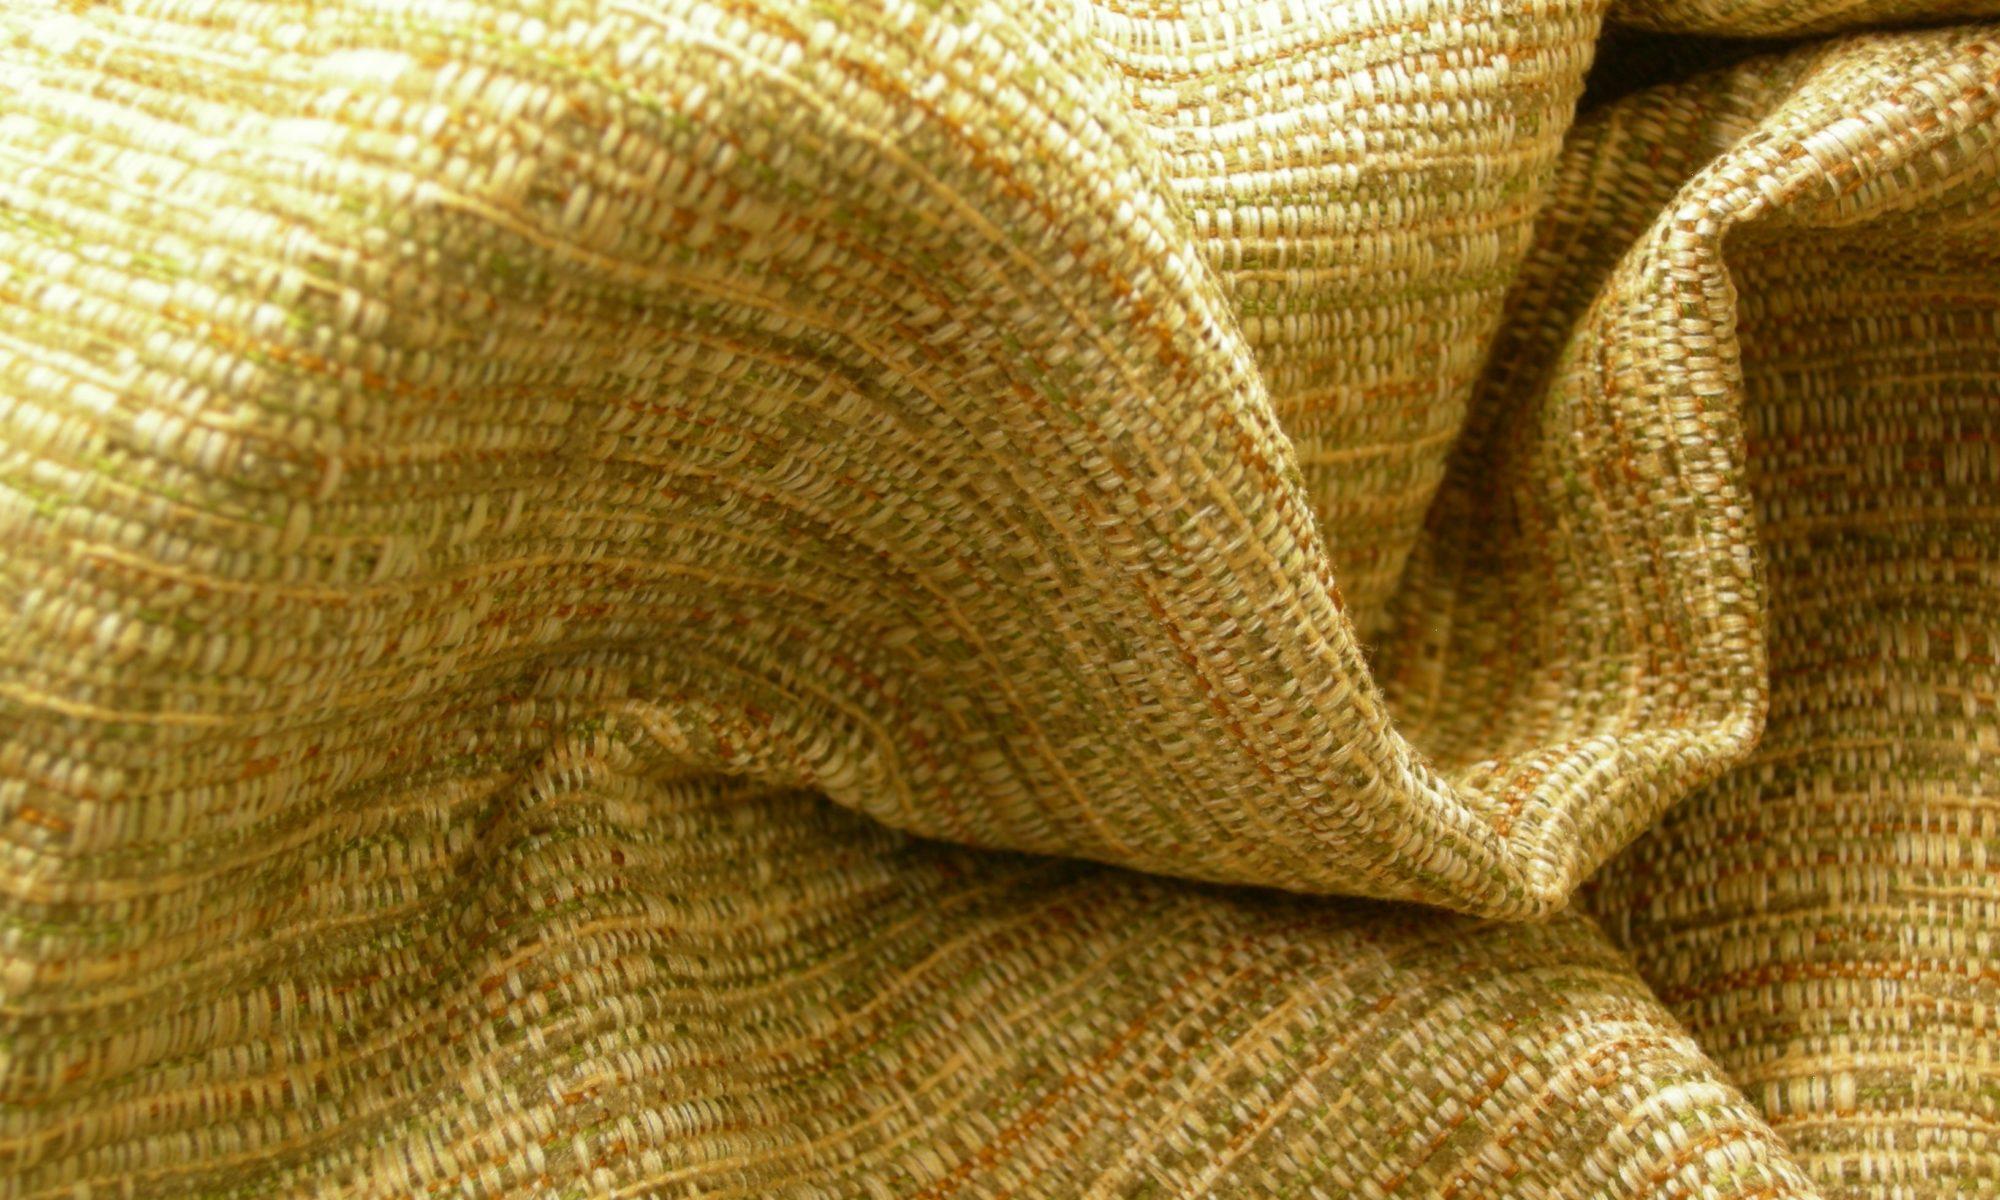 ART 7157 shantung chanel jacket vest fabric WIDTH cm140 WEIGHT gr500 COMPOSITION 42 viscose 41 polyester 17 cotton - 100mts